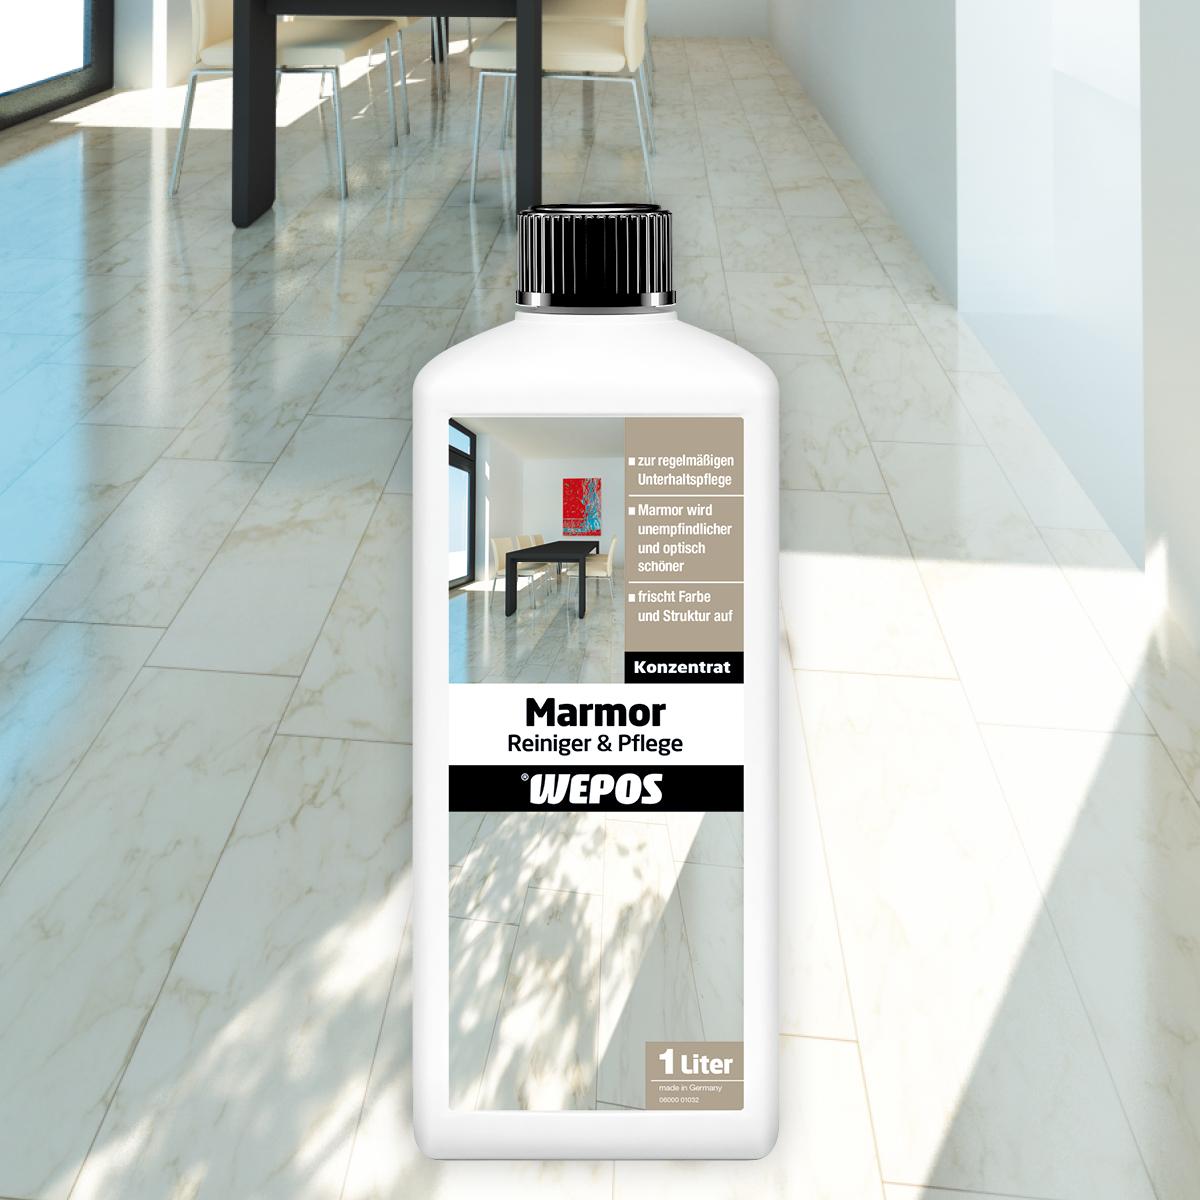 Marmor Reiniger & Pflege